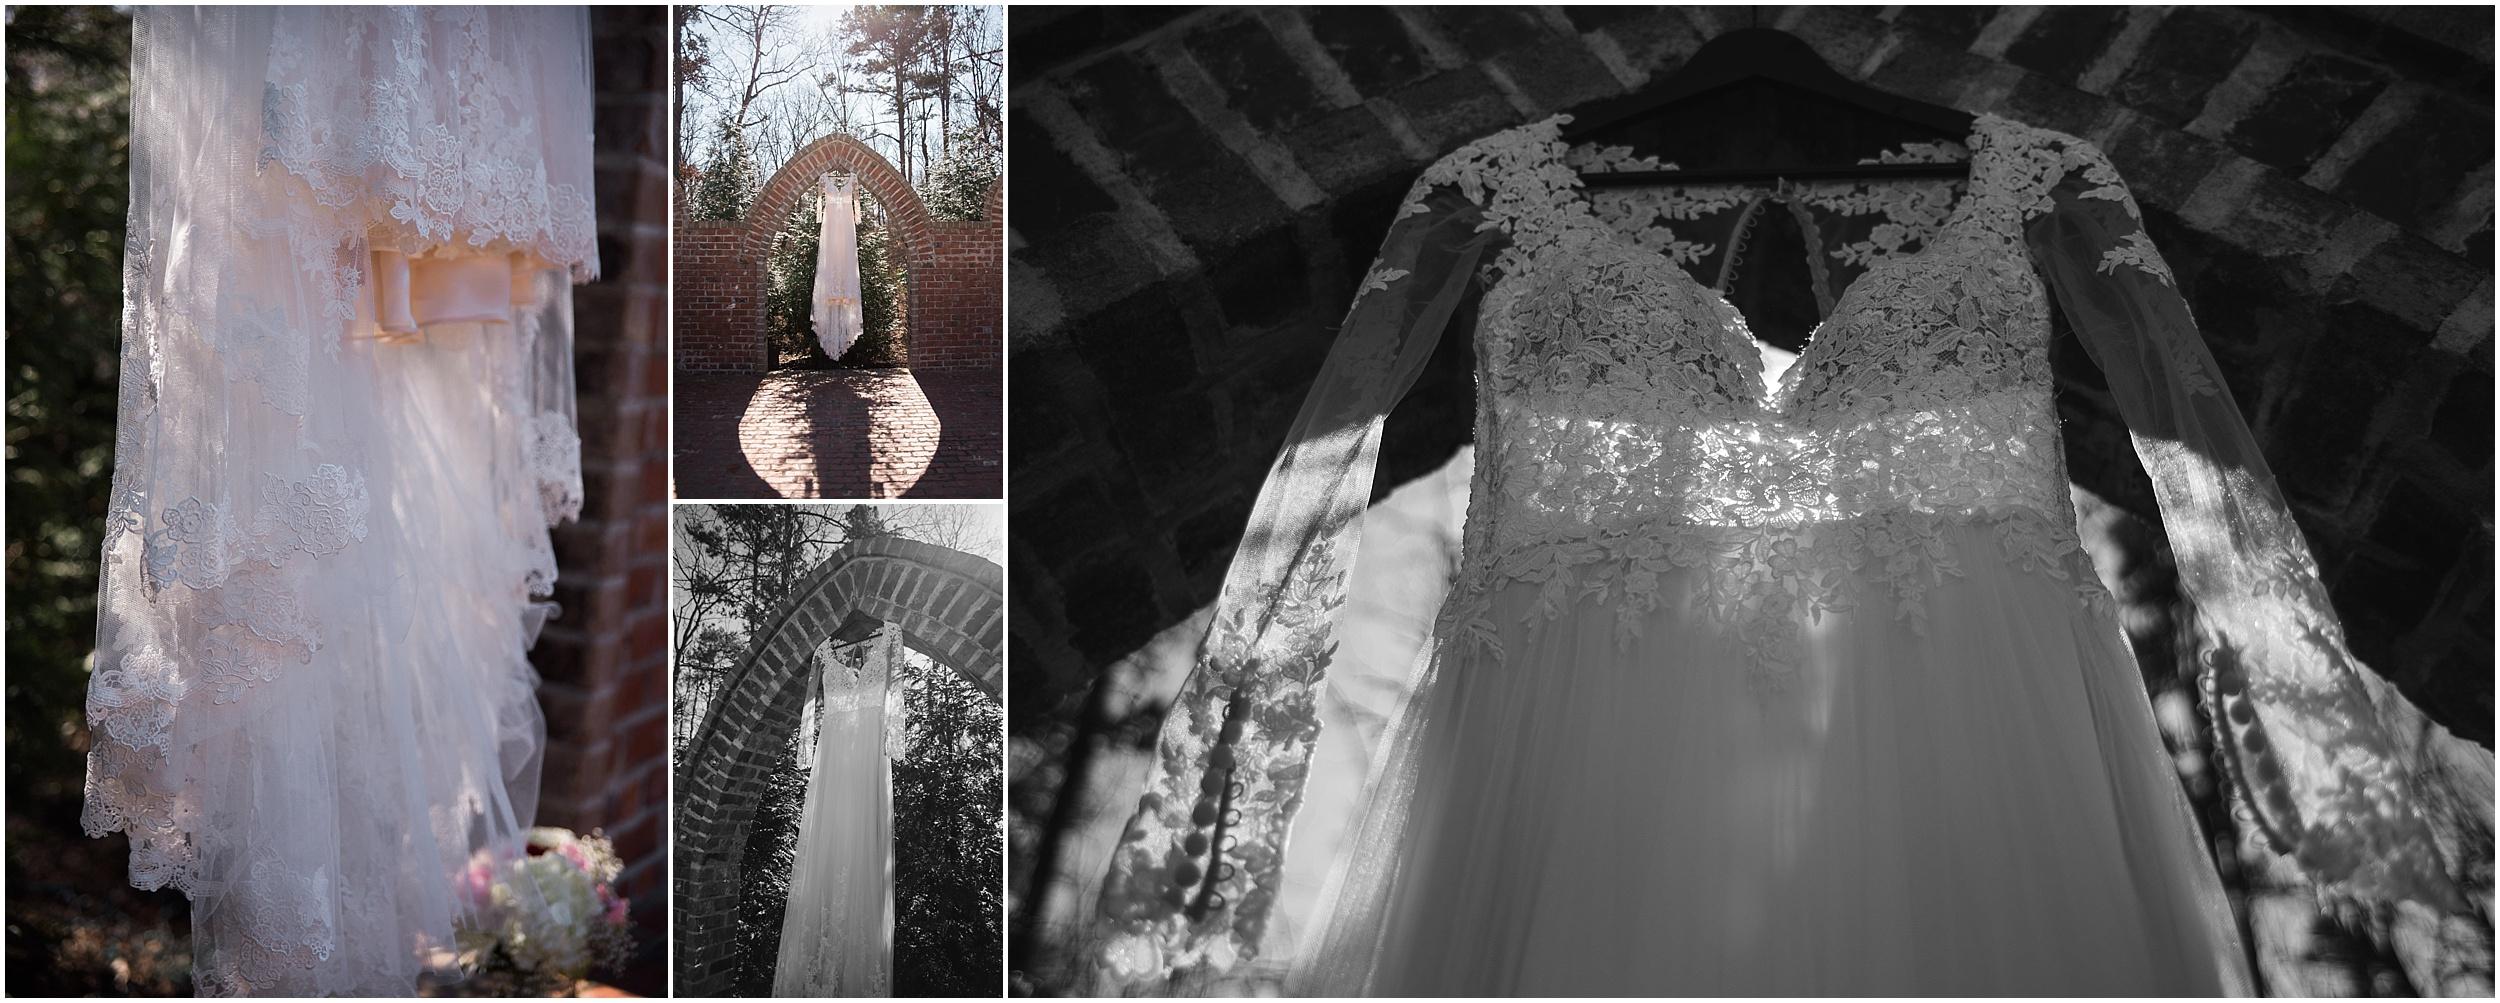 Ariel & Josh Southern Wedding in Monroe, North Carolina_0009.jpg